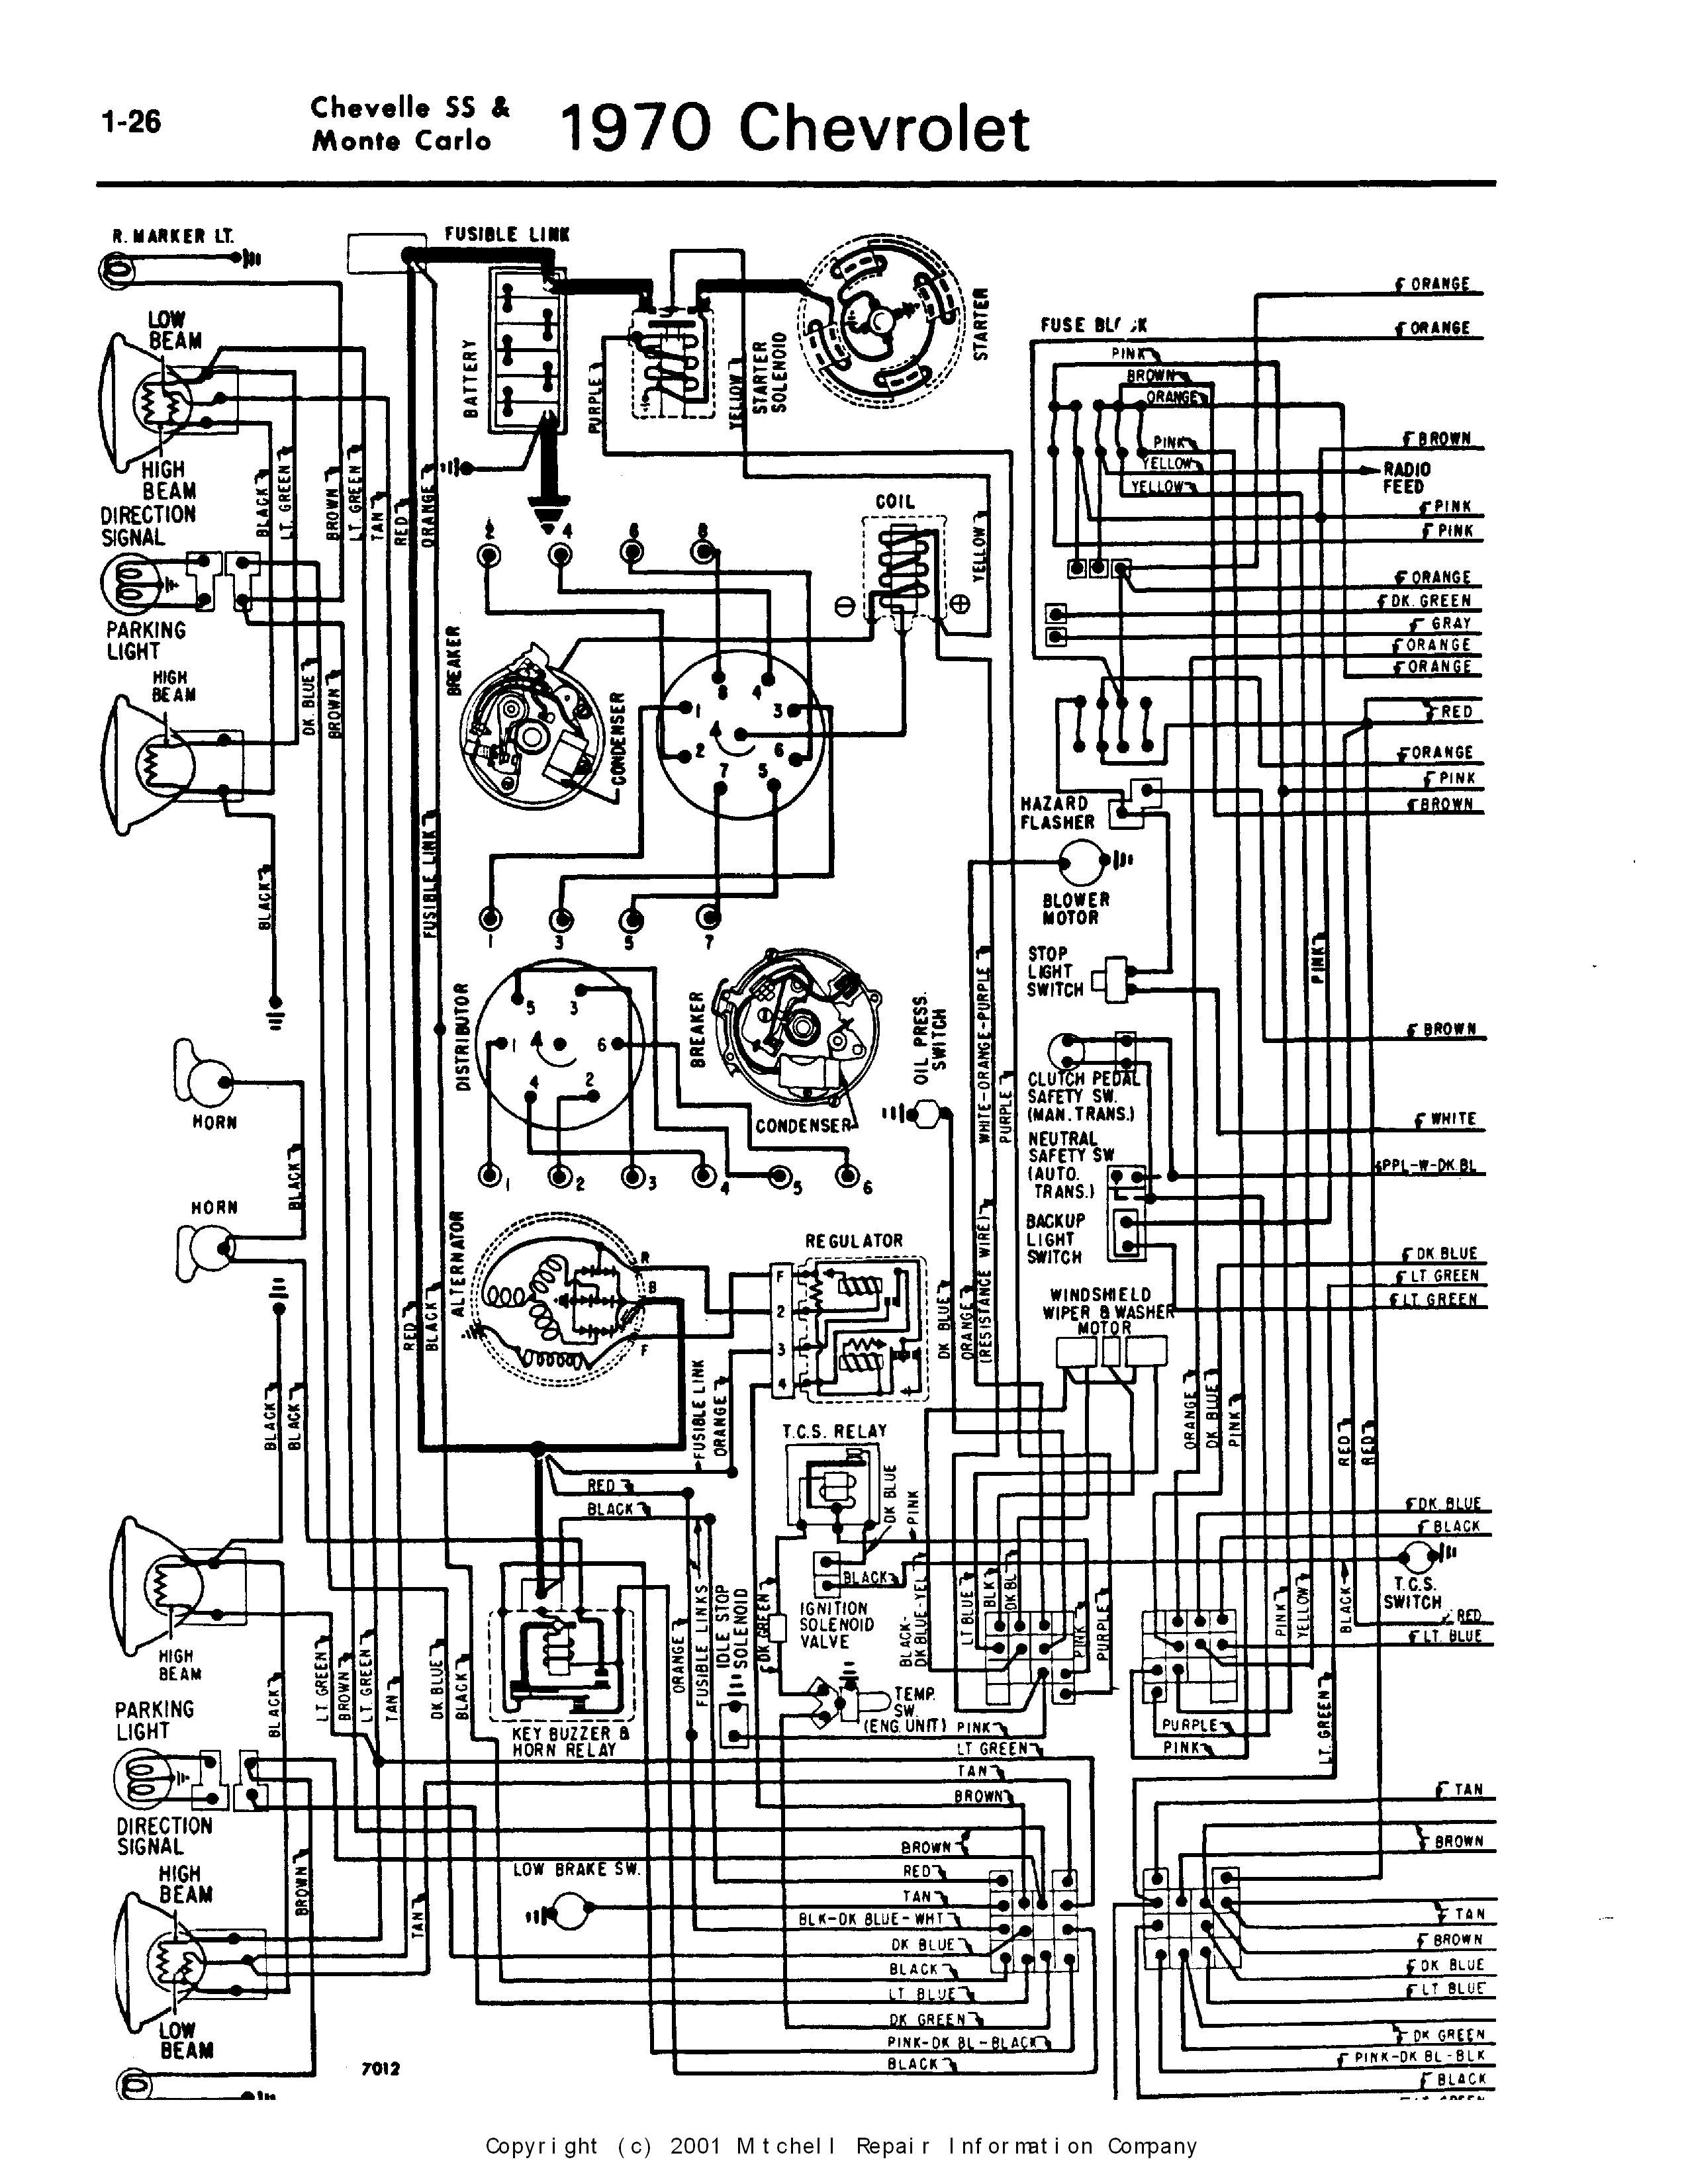 Wiring Diagram 1970 Camaro - Electrical Work Quality Plan for Wiring  Diagram SchematicsWiring Diagram Schematics